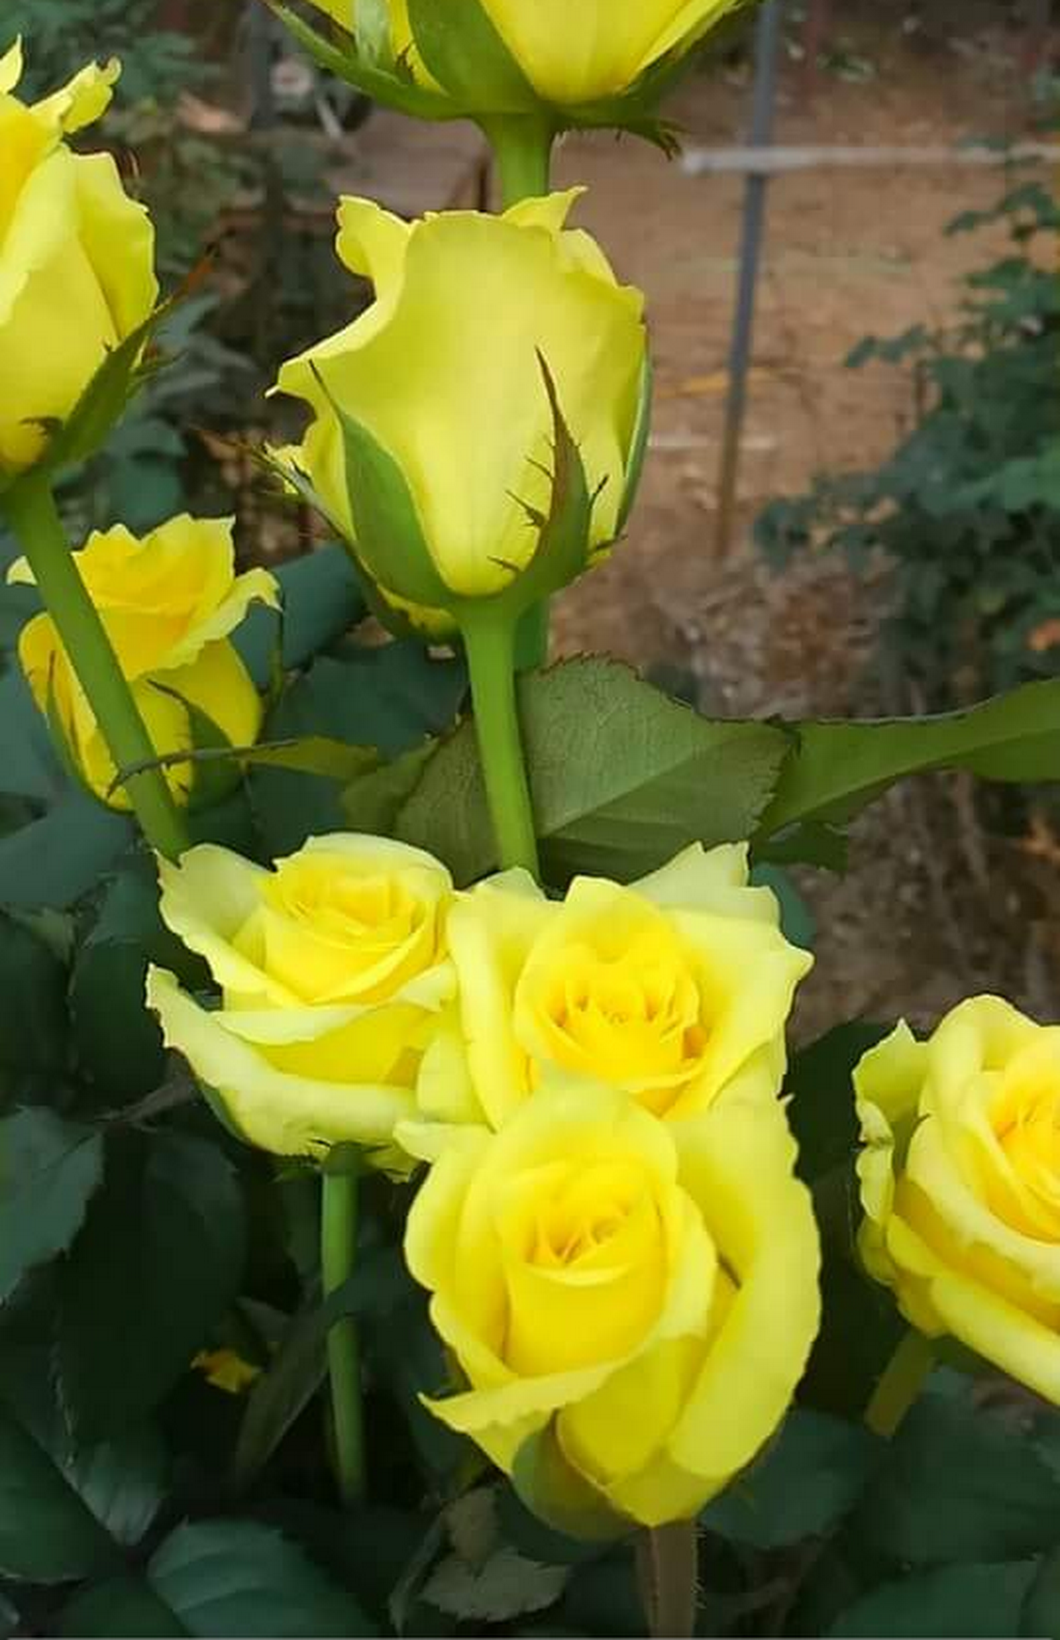 Beauty nature yellowflowers photography rose rajan anand beauty nature yellowflowers photography rose rajan anand google izmirmasajfo